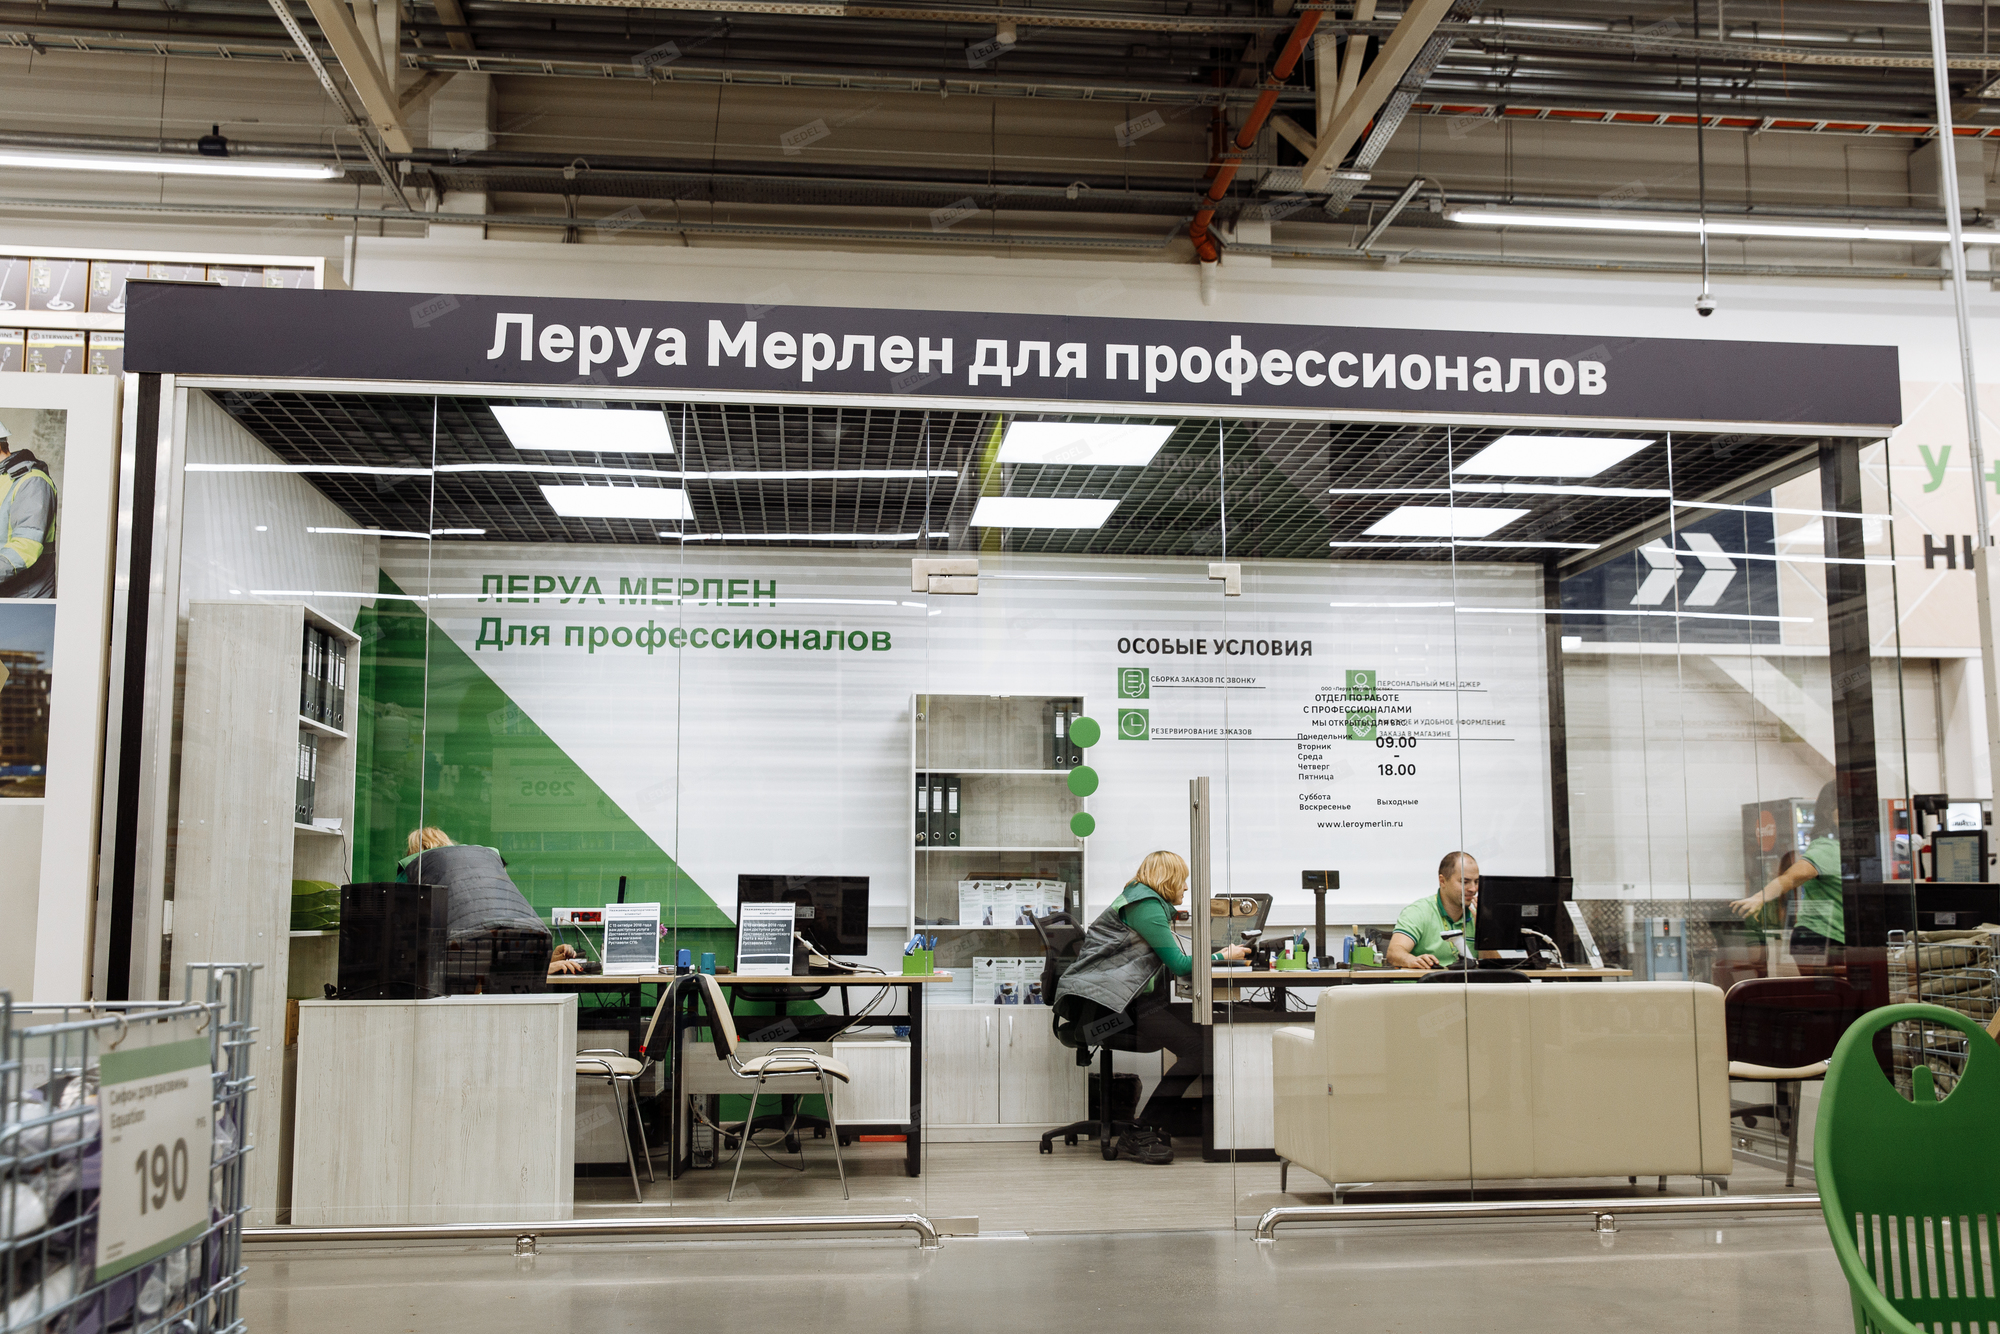 Lerua Merlin Ru Магазин